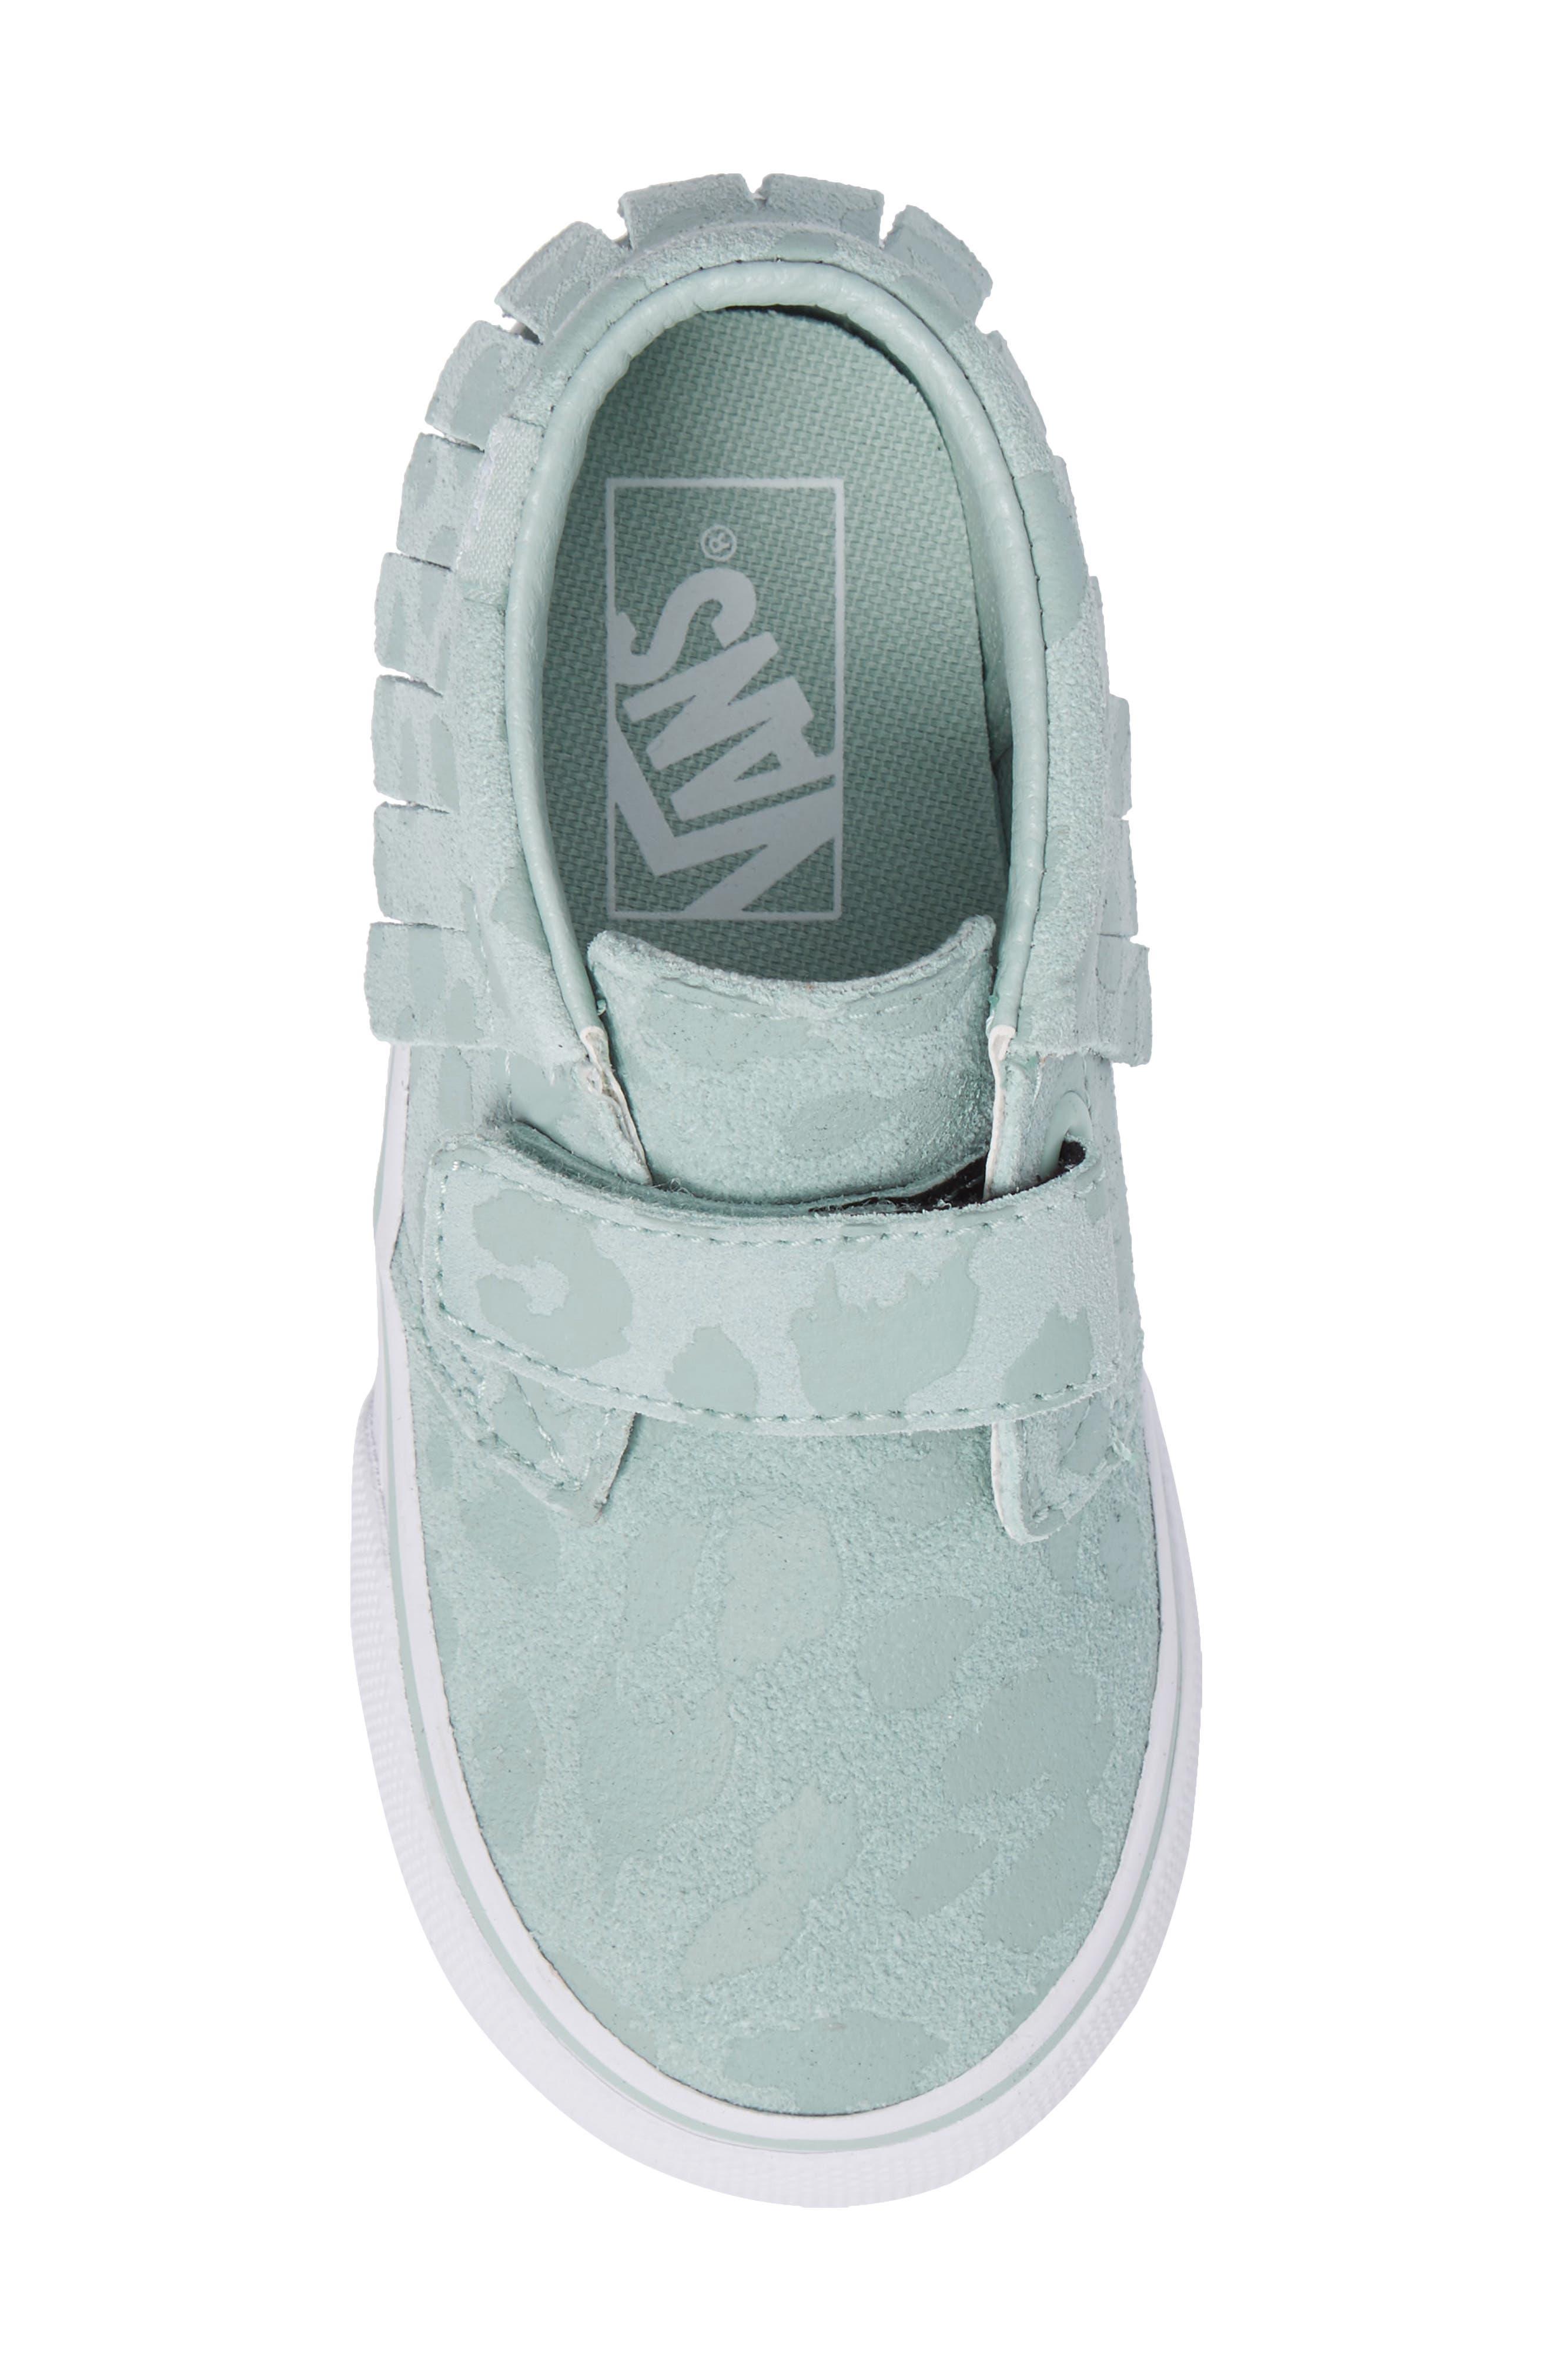 Chukka V Moc Sneaker,                             Alternate thumbnail 5, color,                             Harbor Gray Leopard Suede